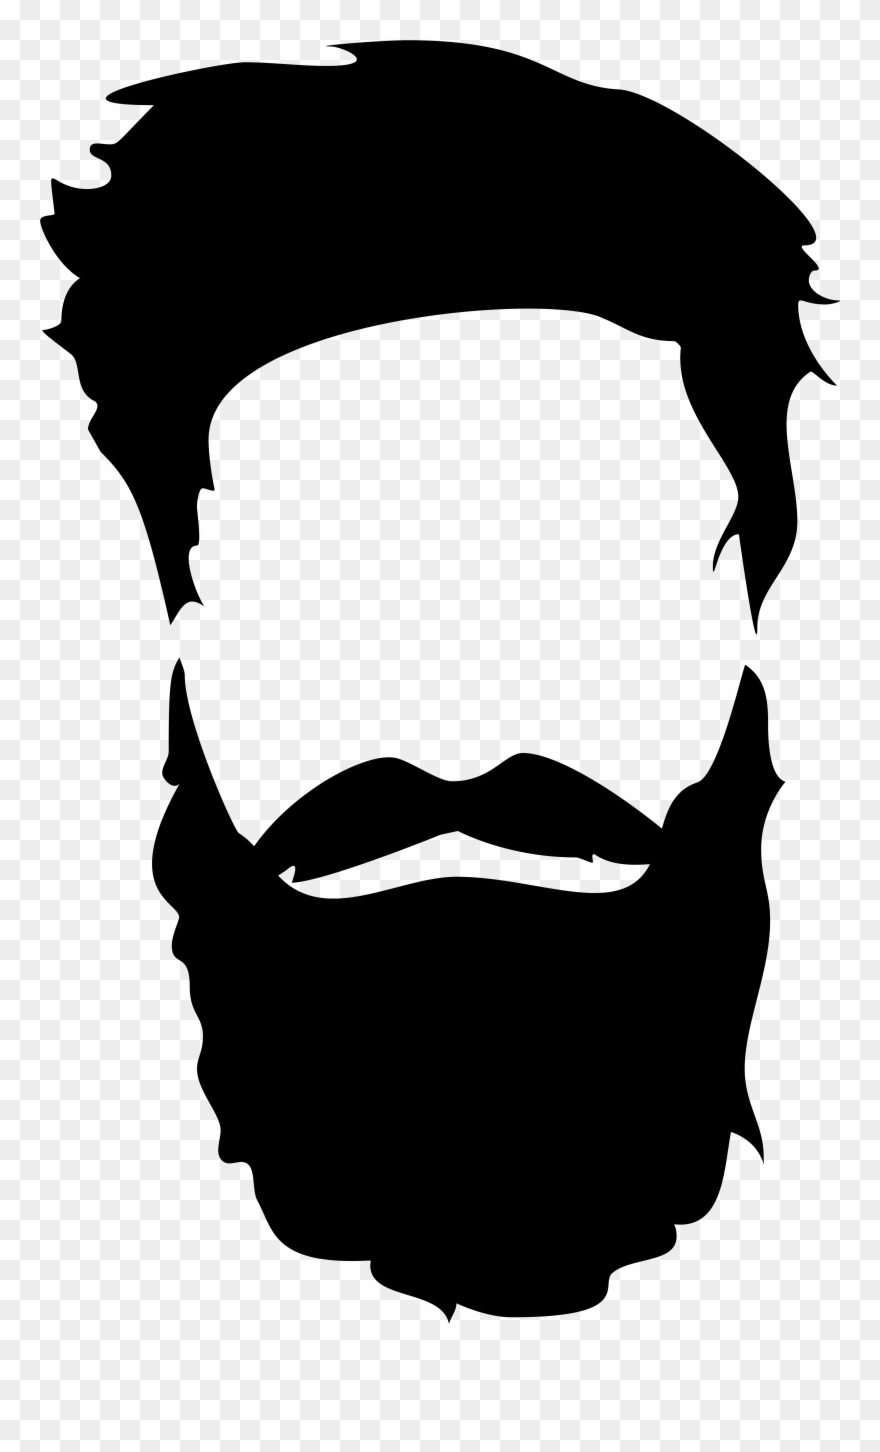 vector black and white Beard clipart dark glass. Hair png clip art